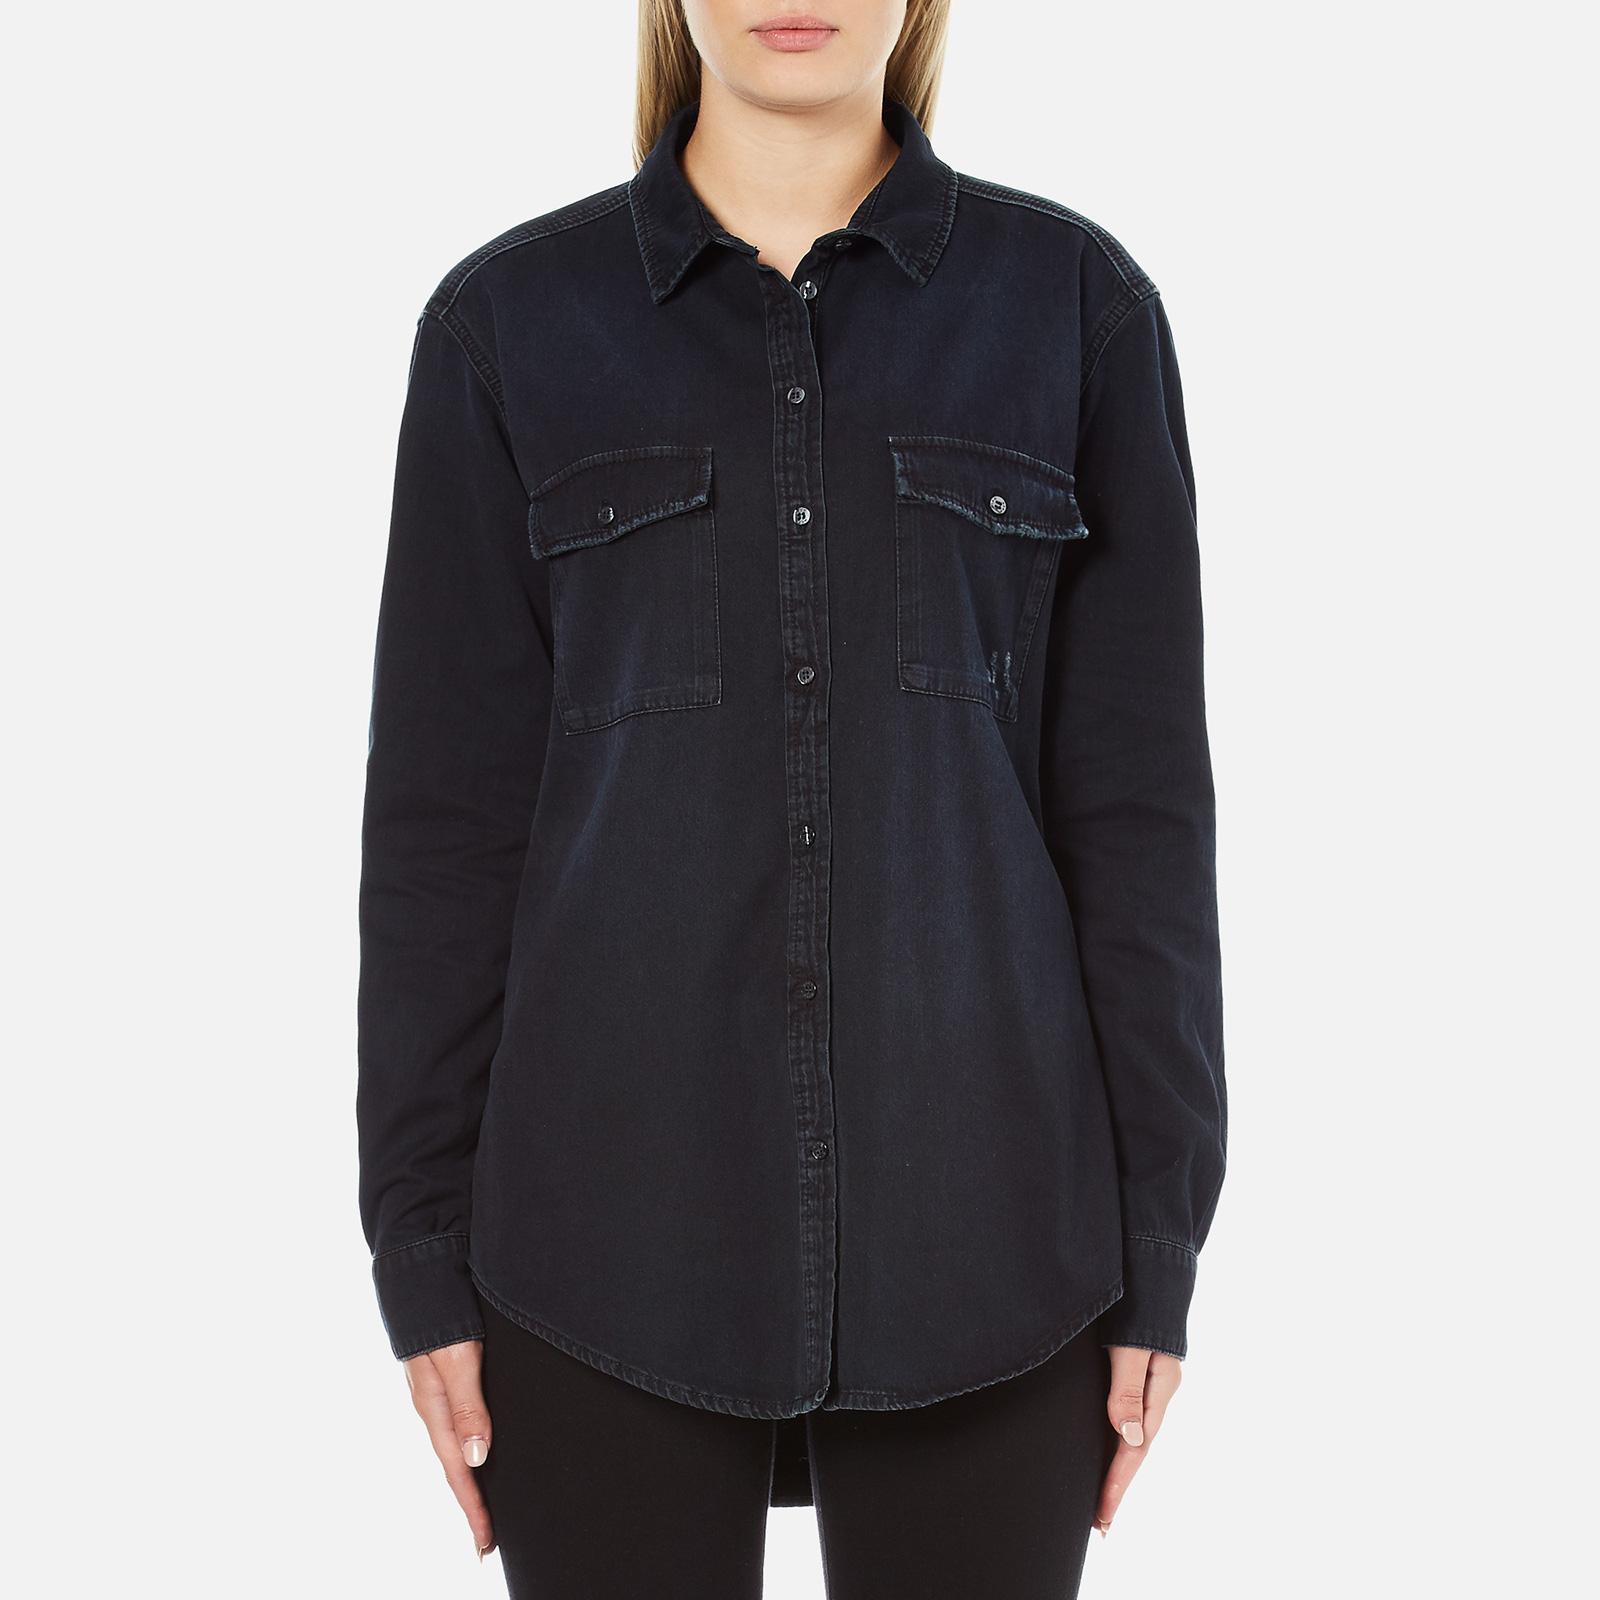 6339c28d MSGM Women's Logo Back Oversized Denim Shirt - Black - Free UK Delivery  over £50